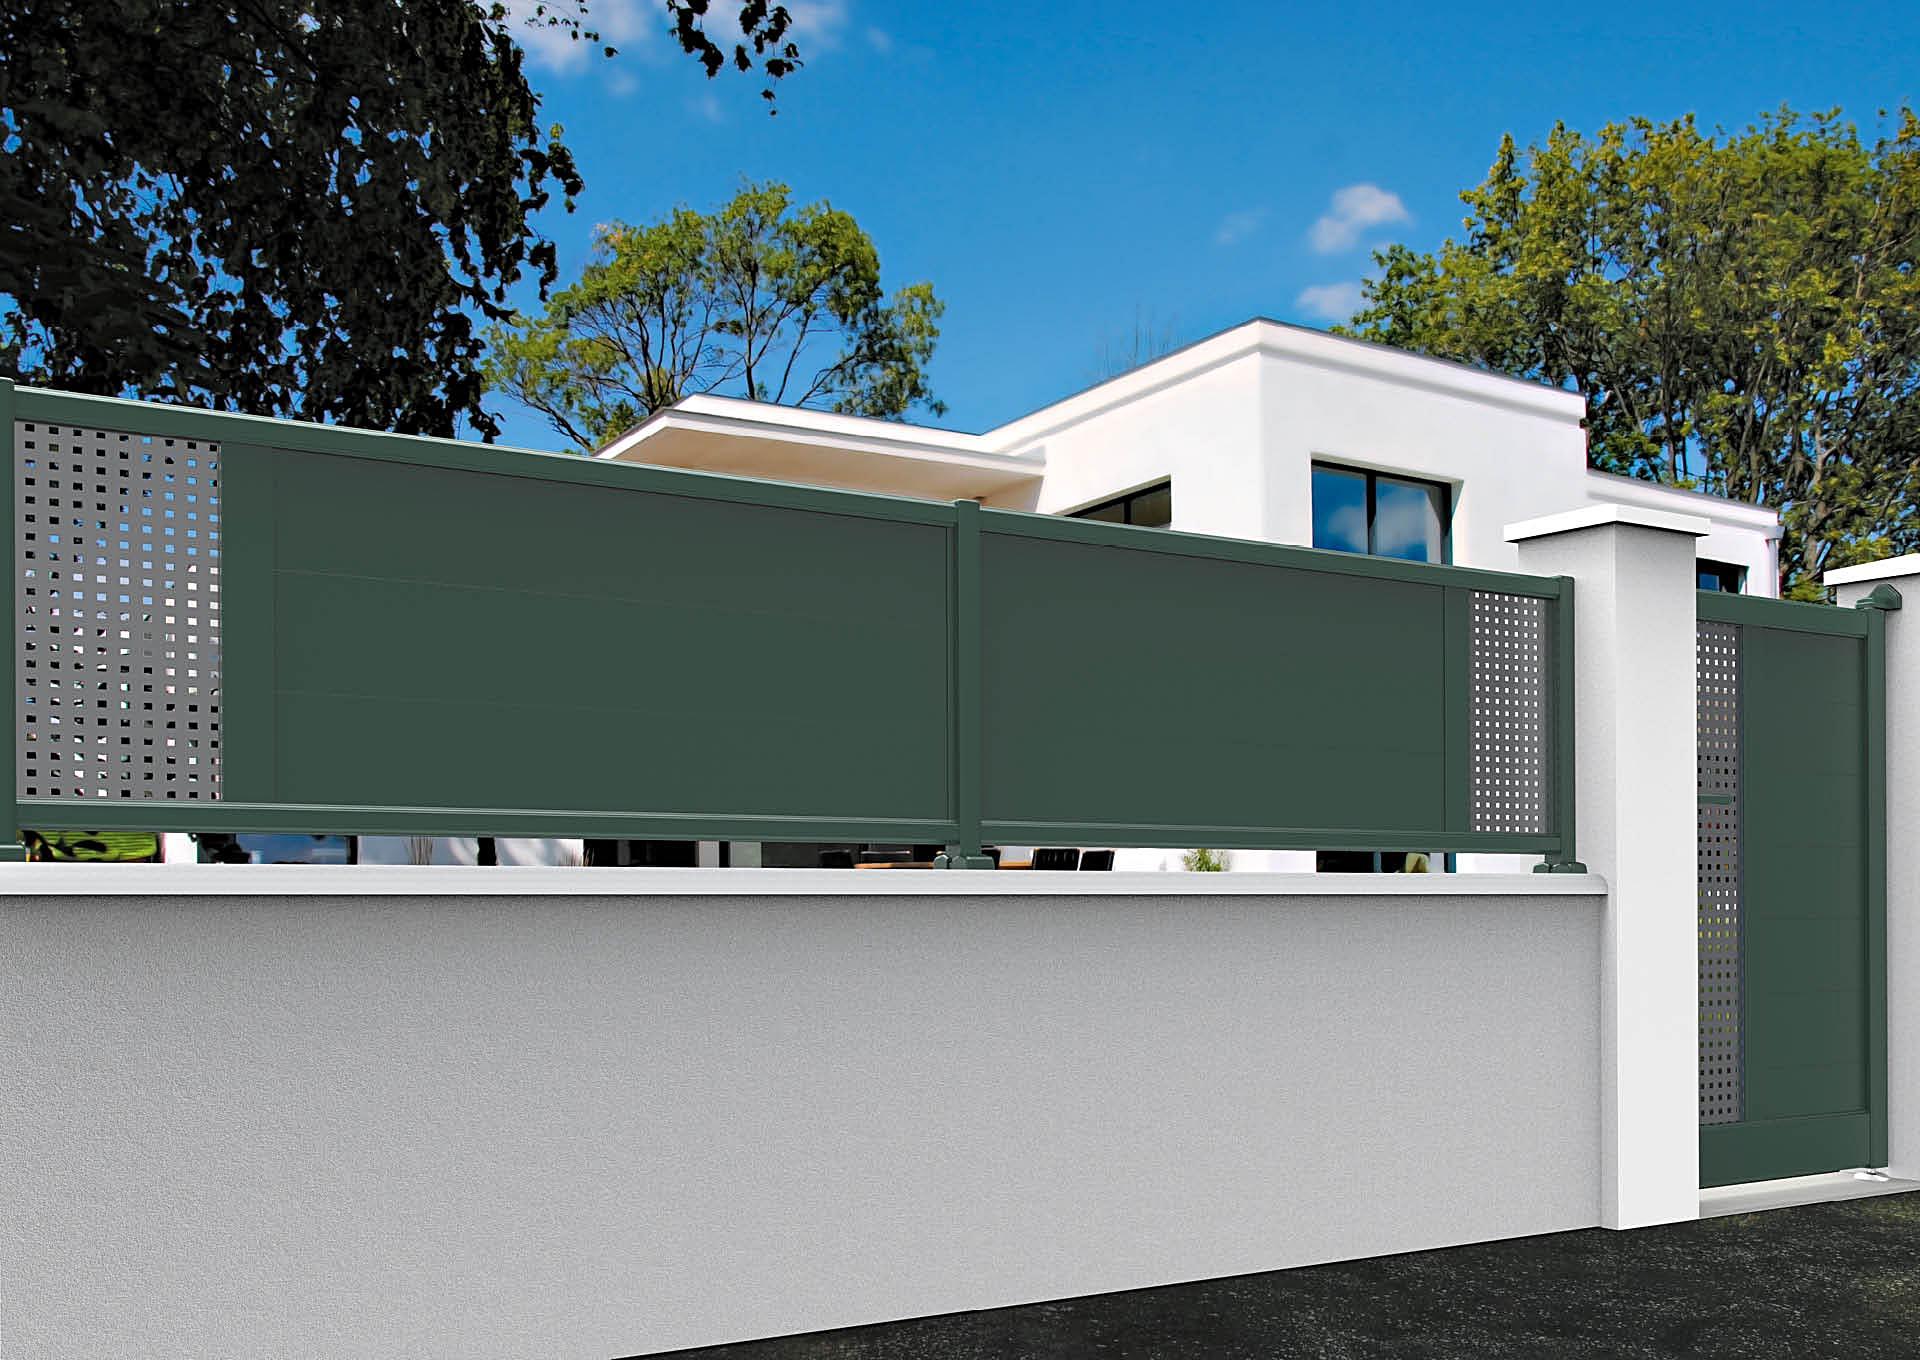 Clôture aluminium lames horizontales 200 mm + décor style inox